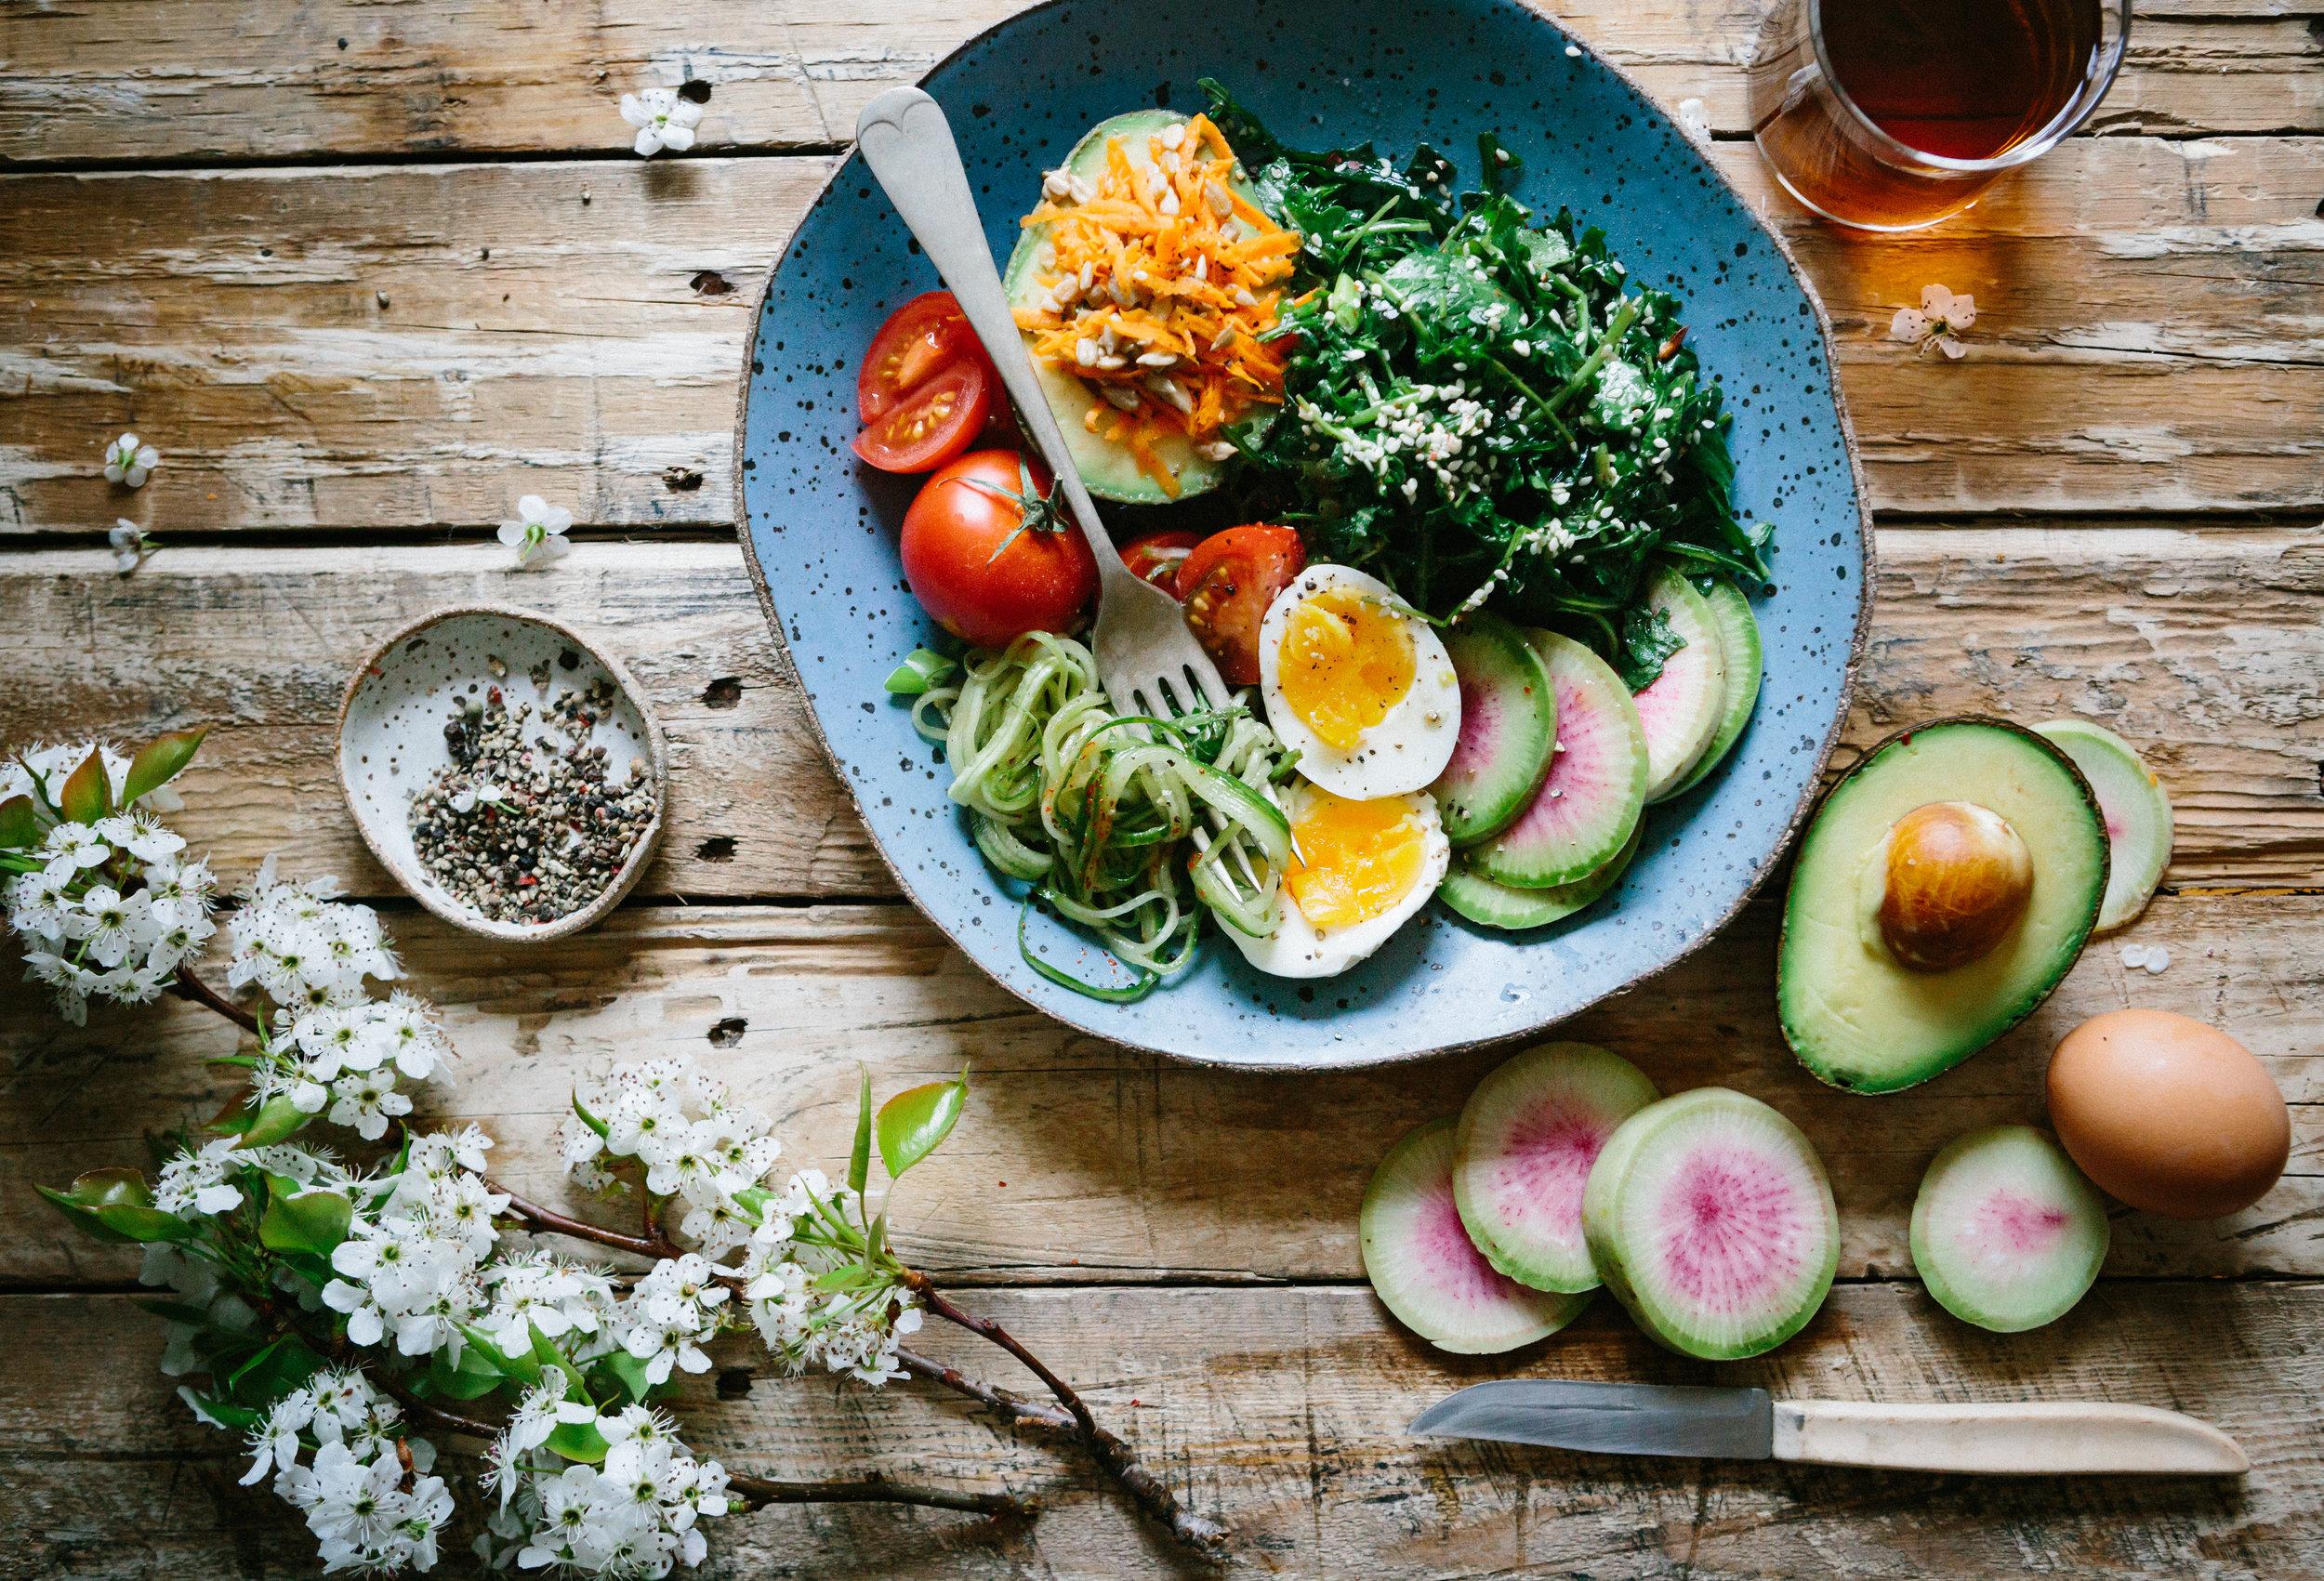 Nutritionpic.jpg